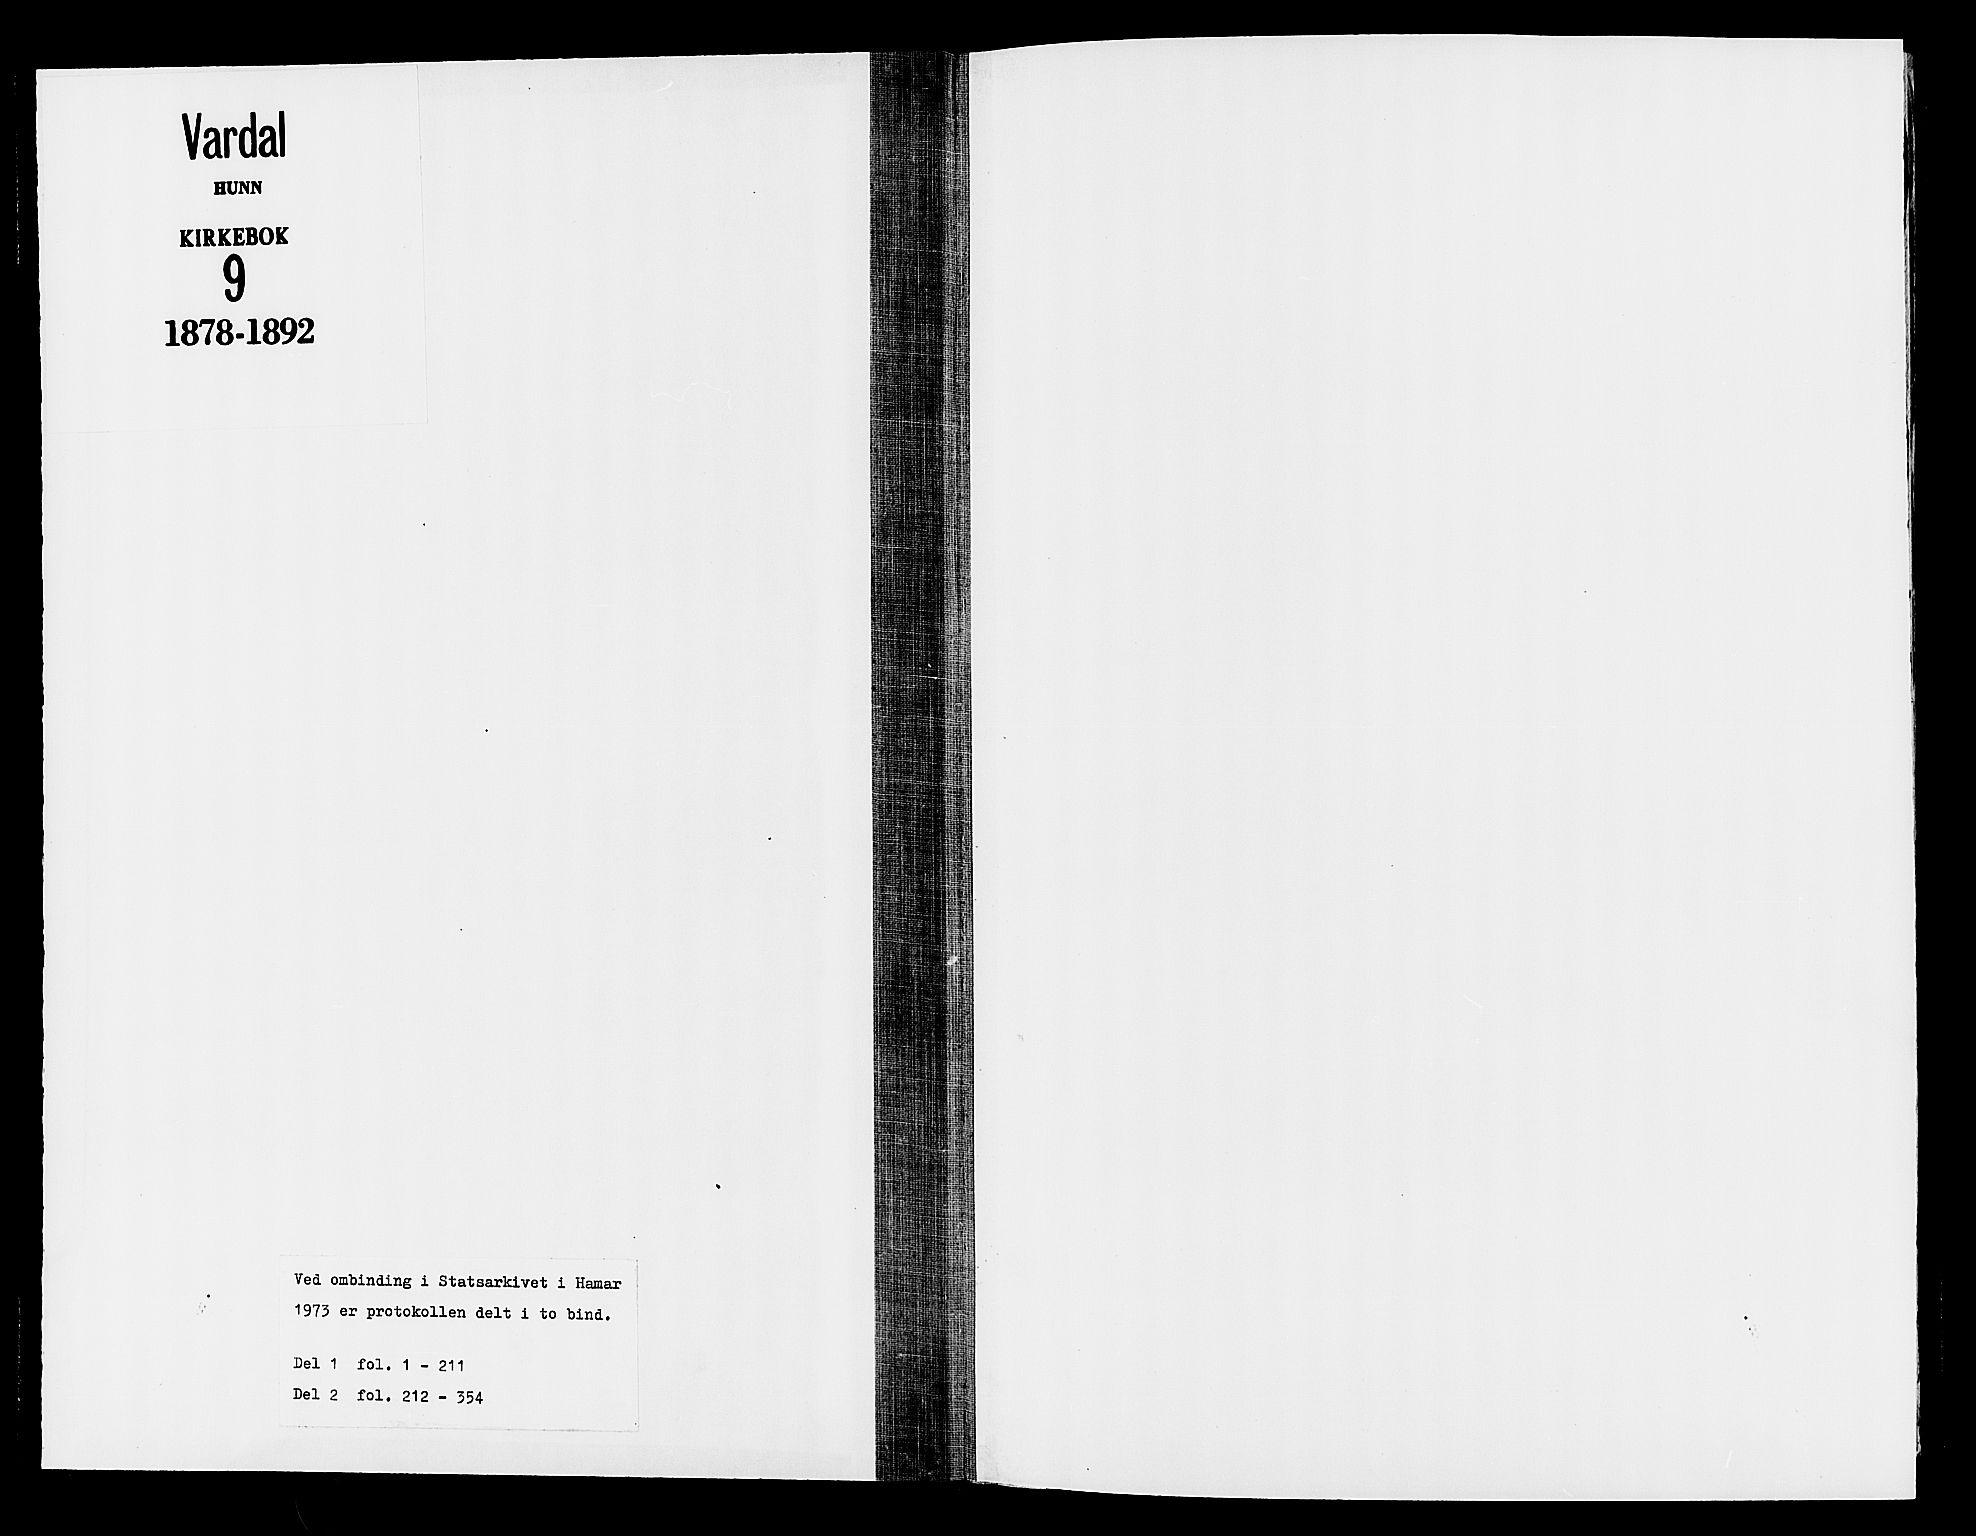 SAH, Vardal prestekontor, H/Ha/Haa/L0009: Ministerialbok nr. 9, 1878-1892